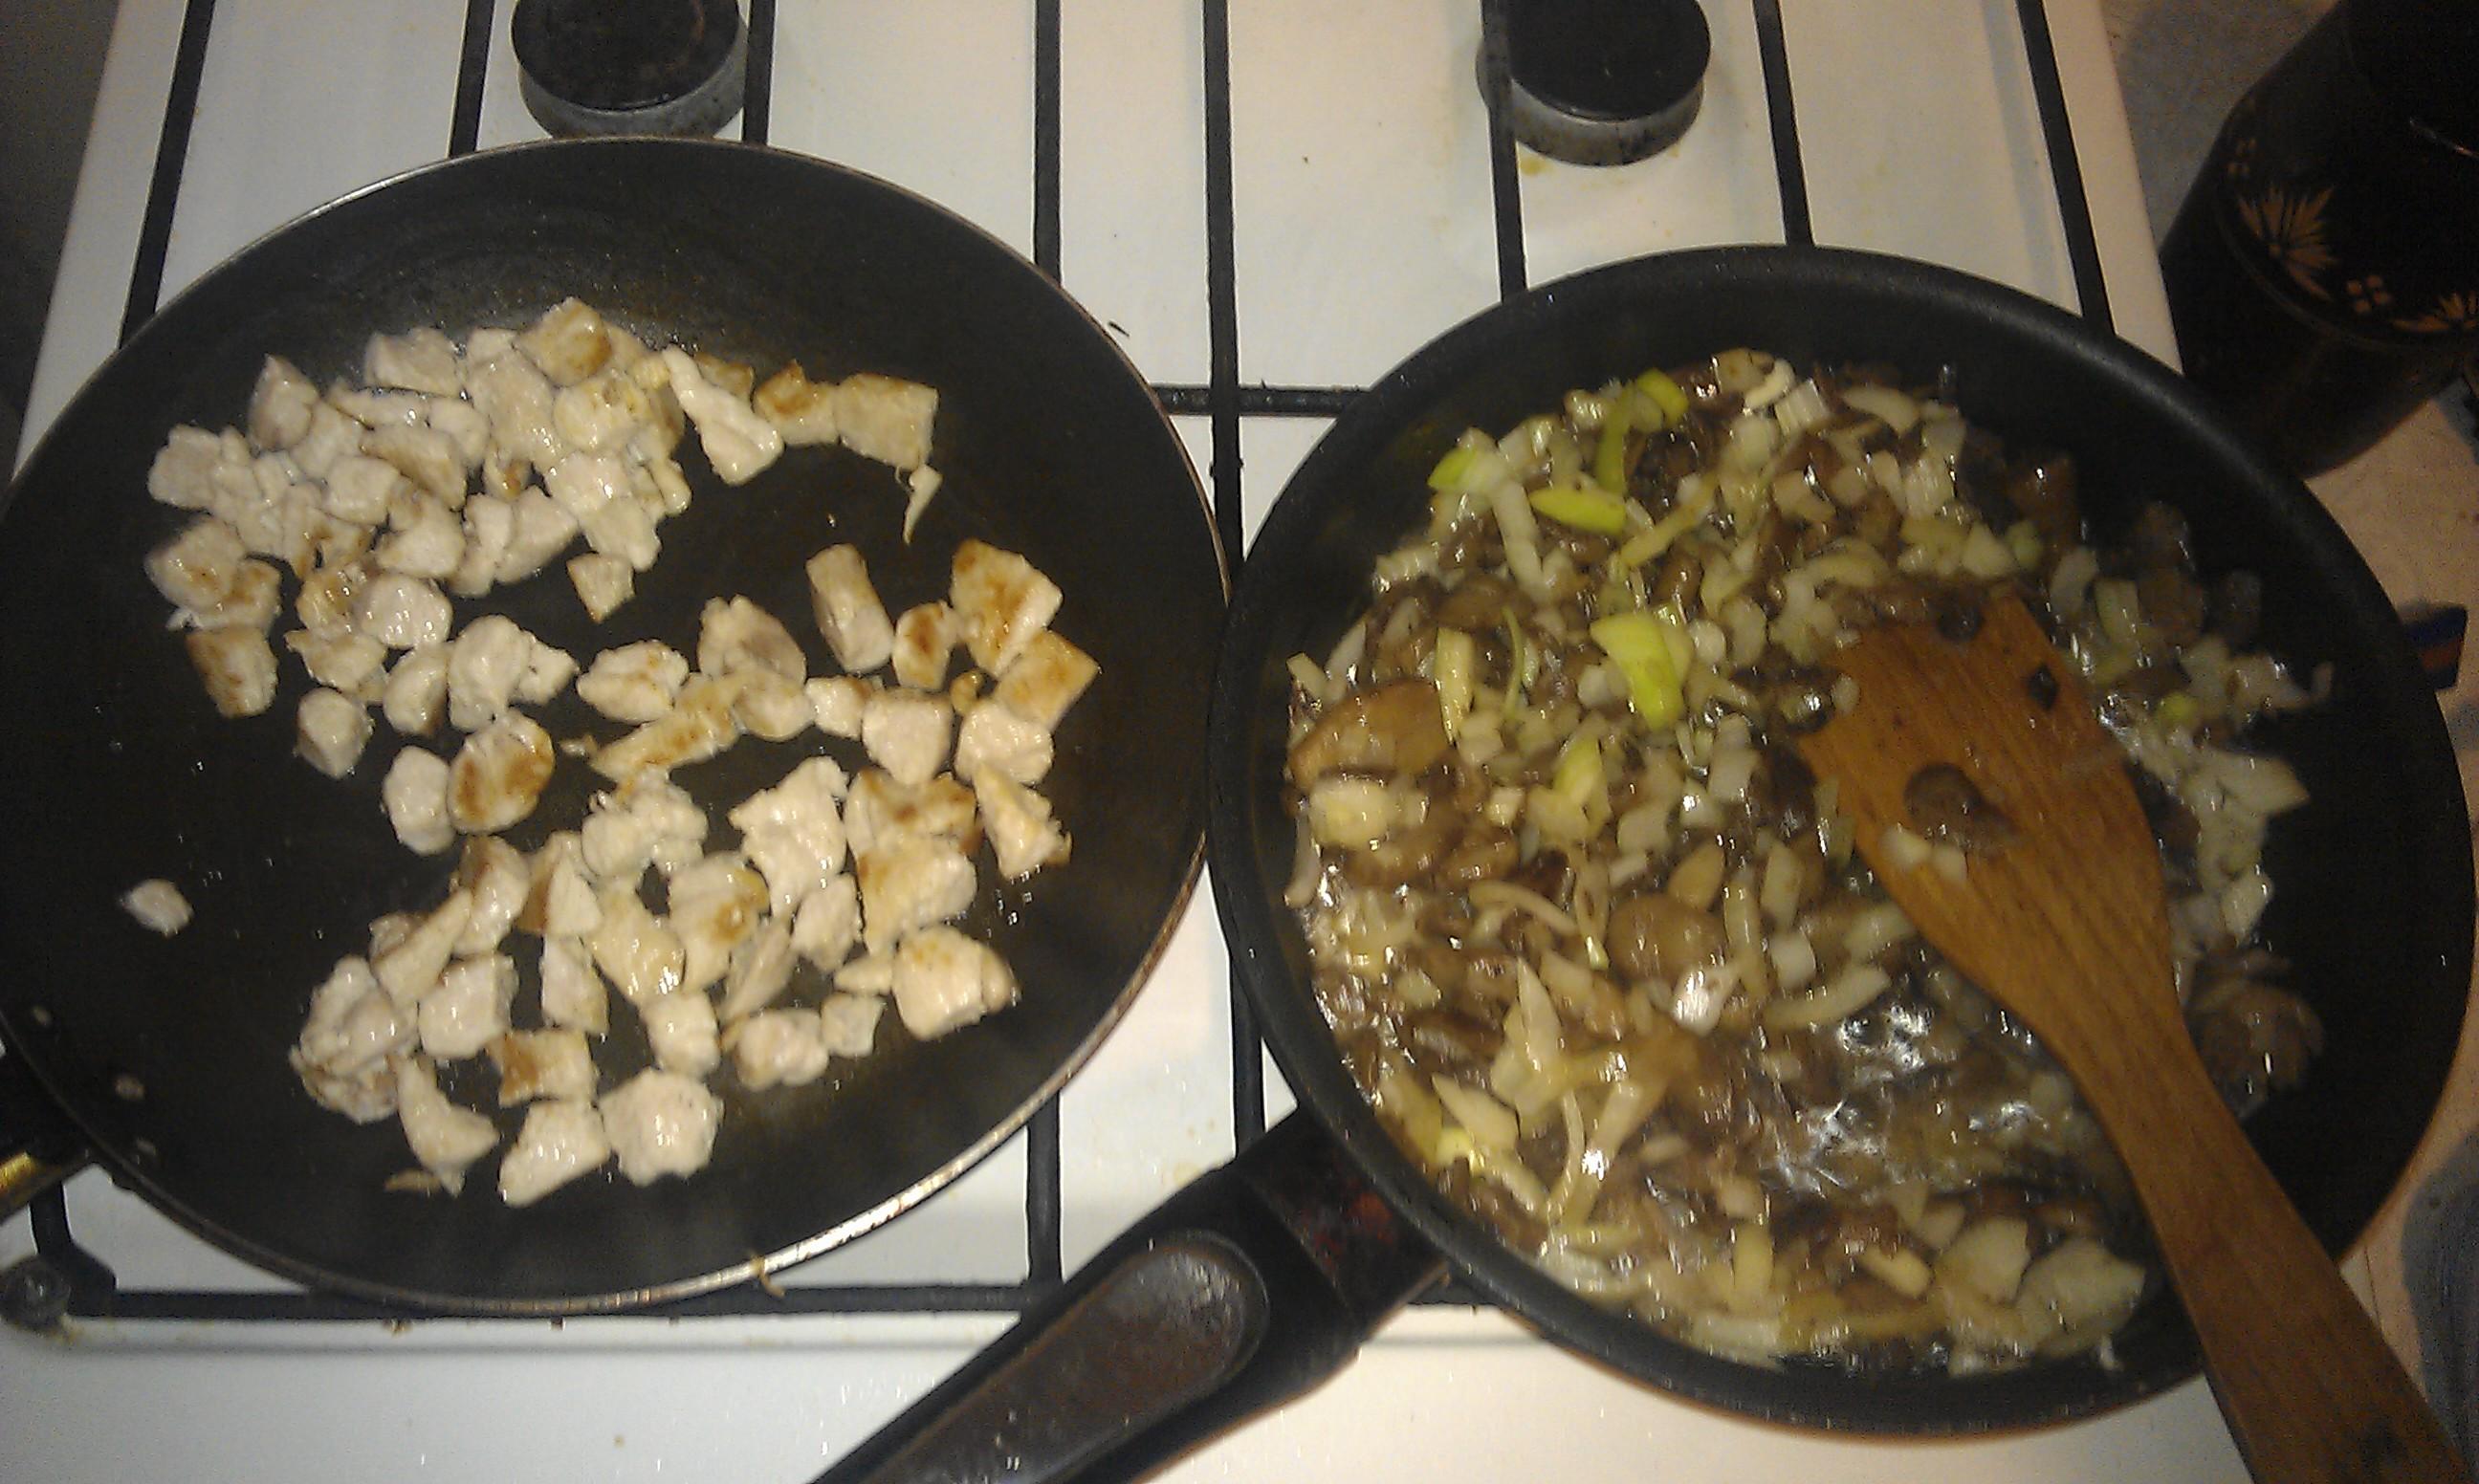 Жареные грибы с луком. Видео рецепт - Woman s Day 6